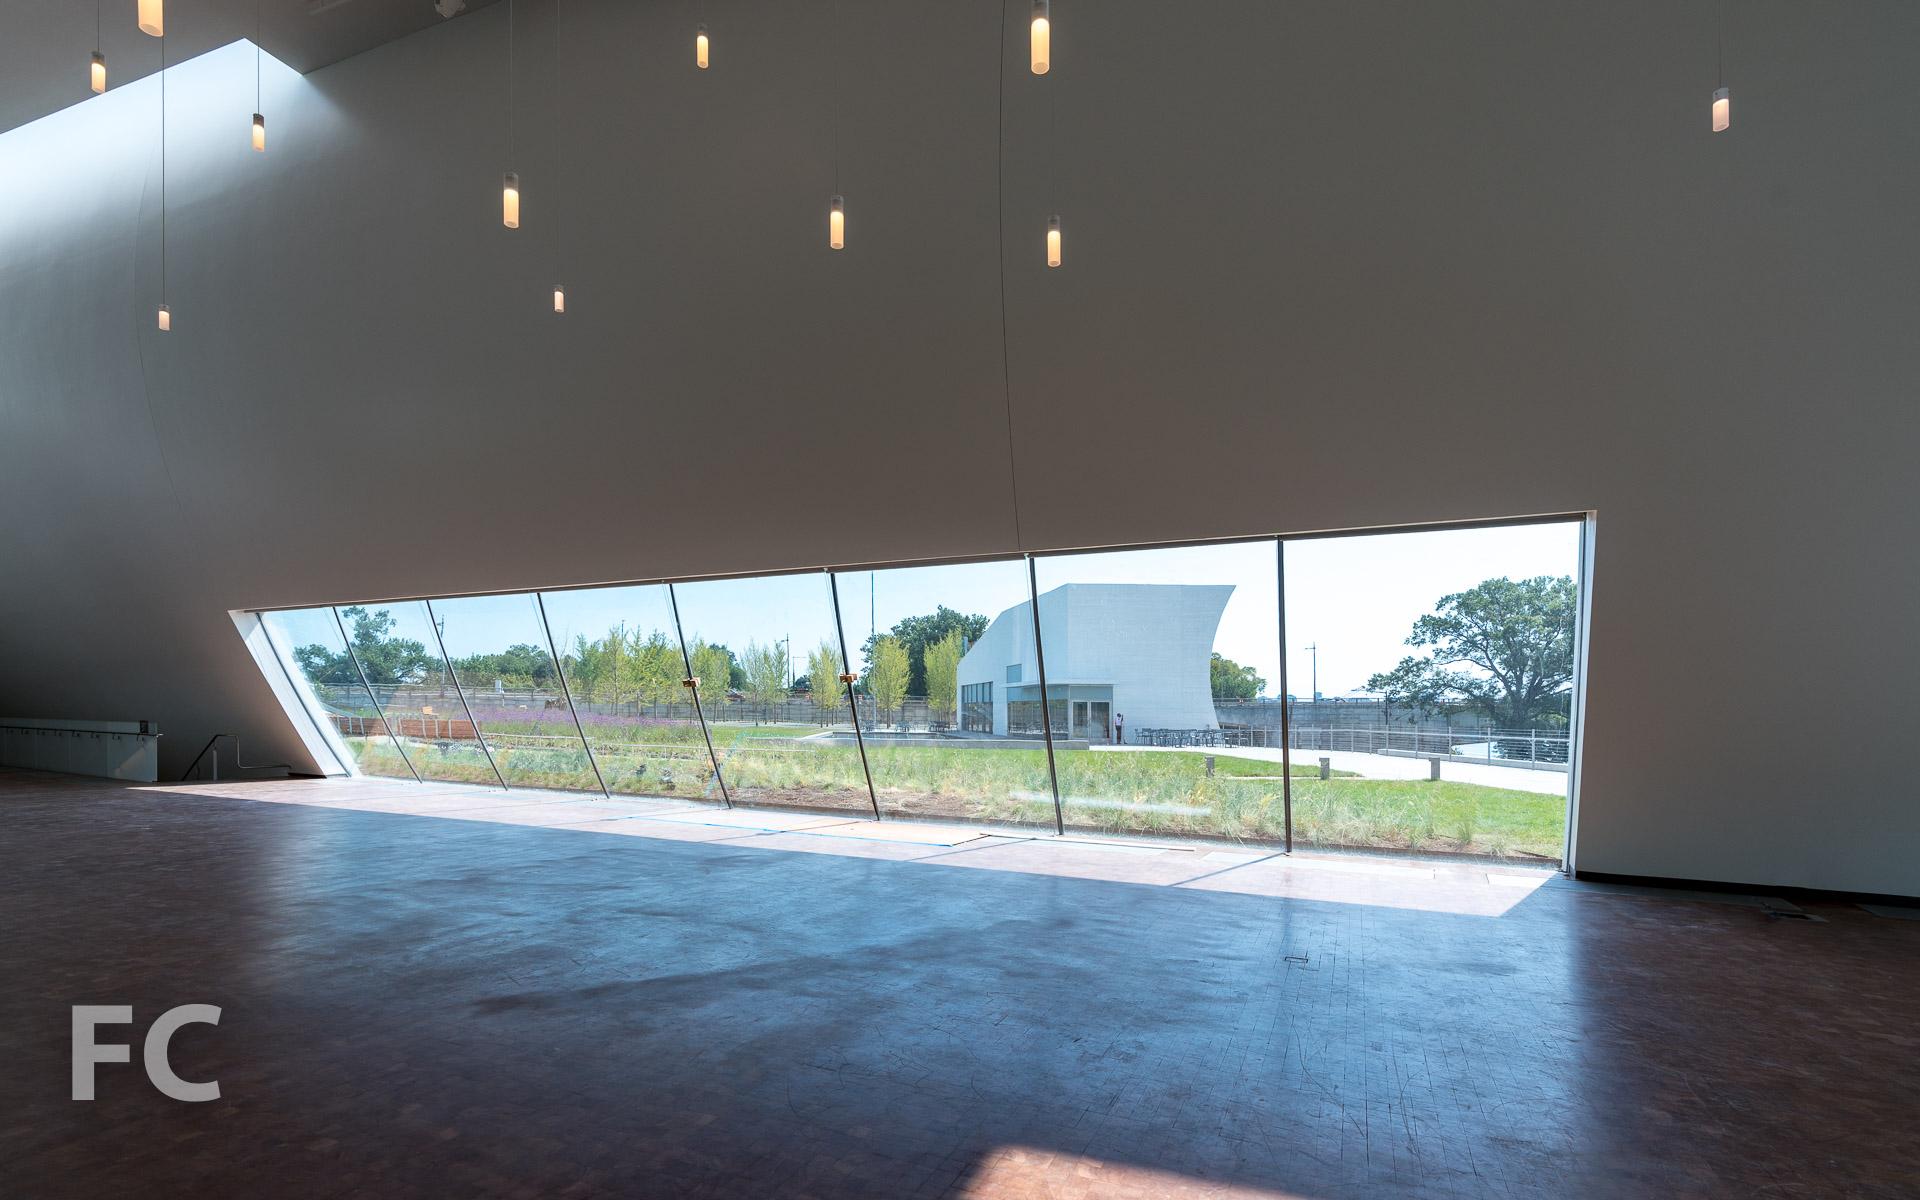 20190831-The Reach at Kennedy Center-DSC05372.jpg